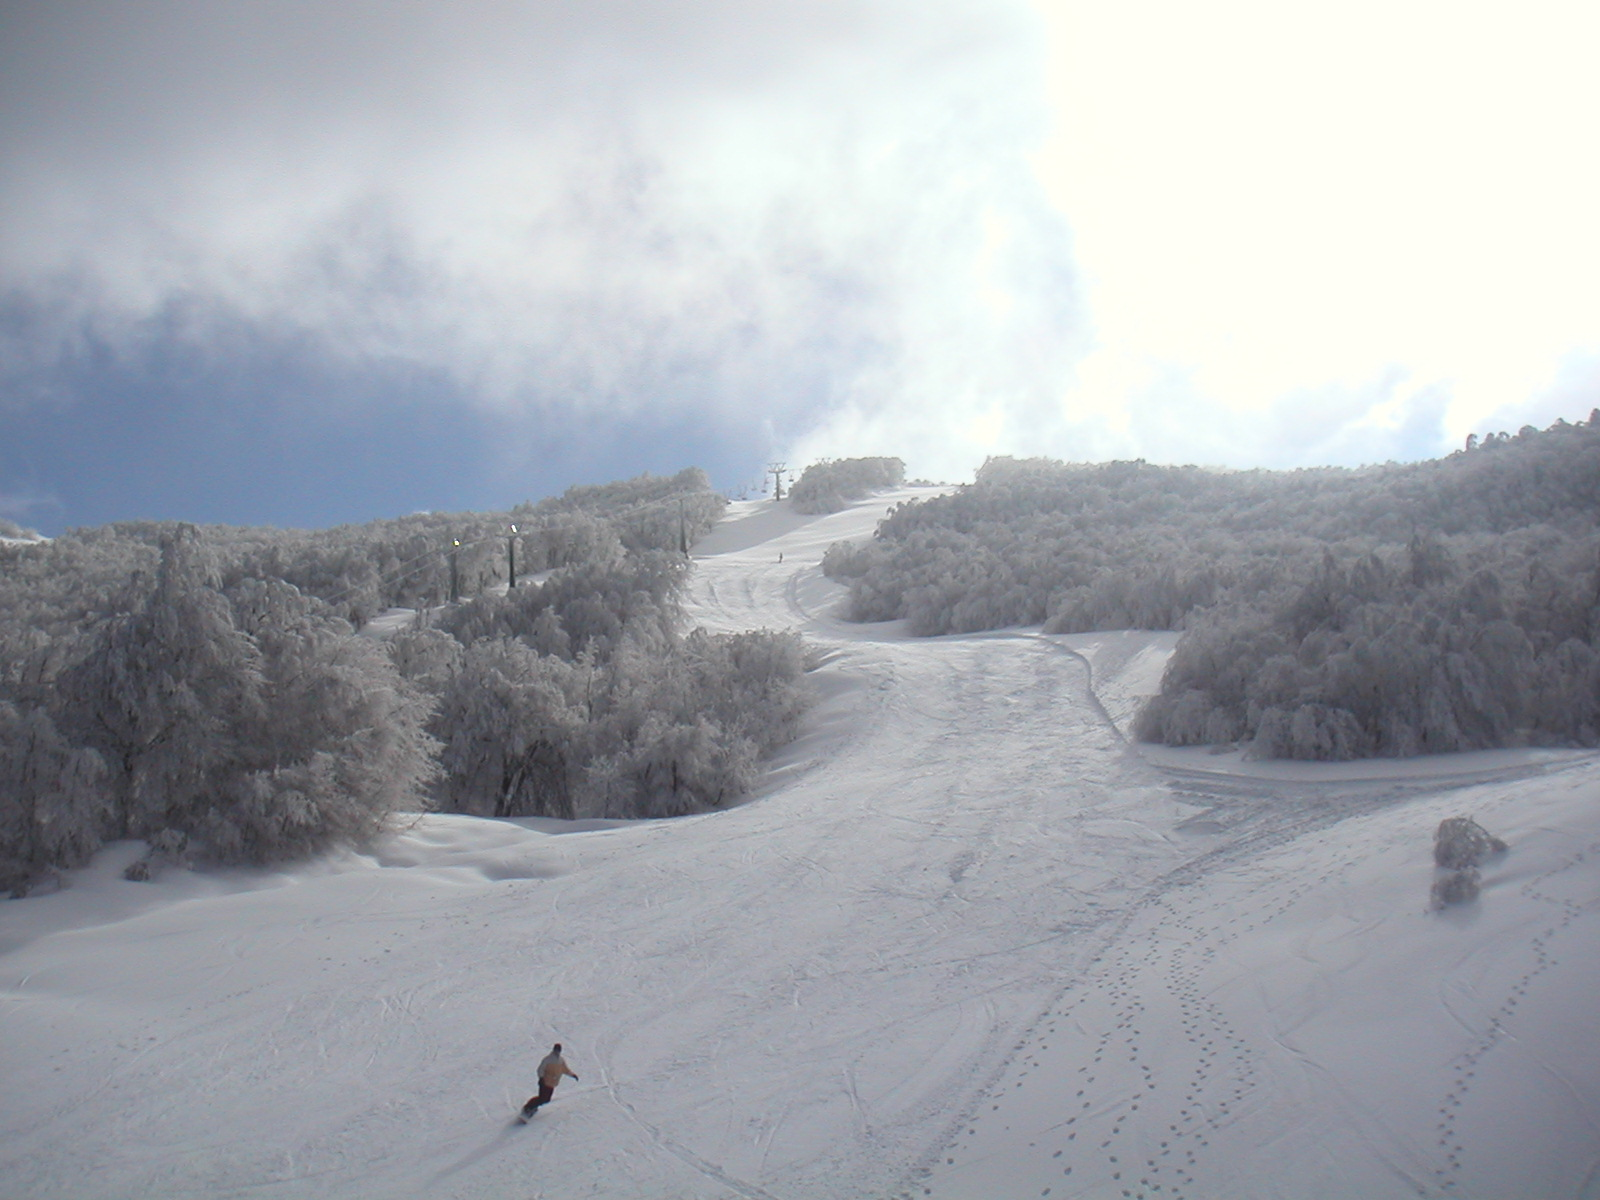 Falconera slope, Pelion resort, Greece, Pilion